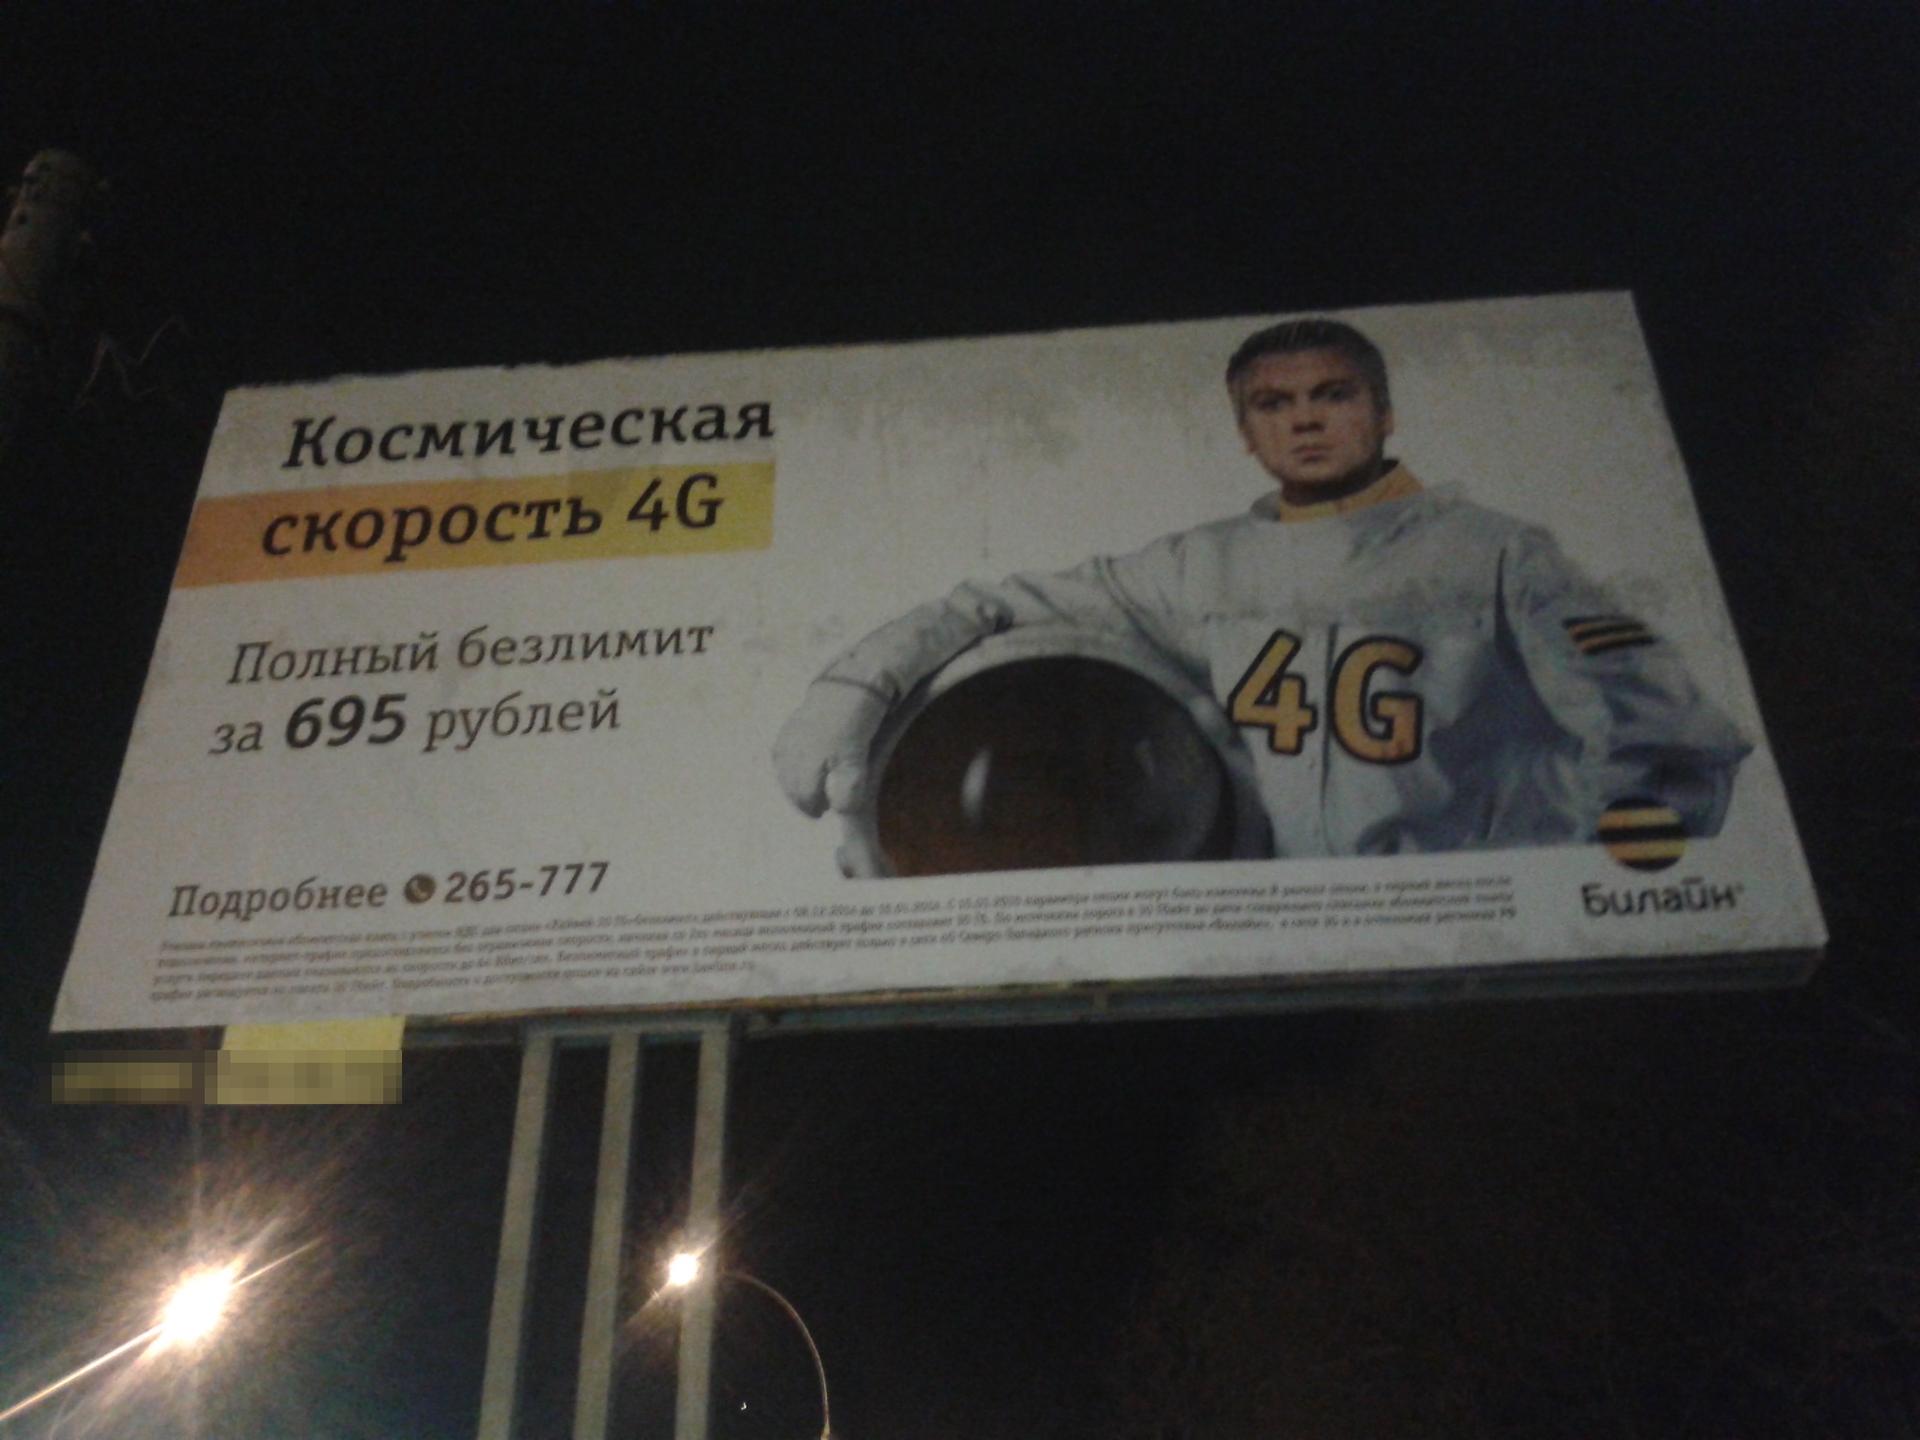 4G/LTE Vologda Beeline